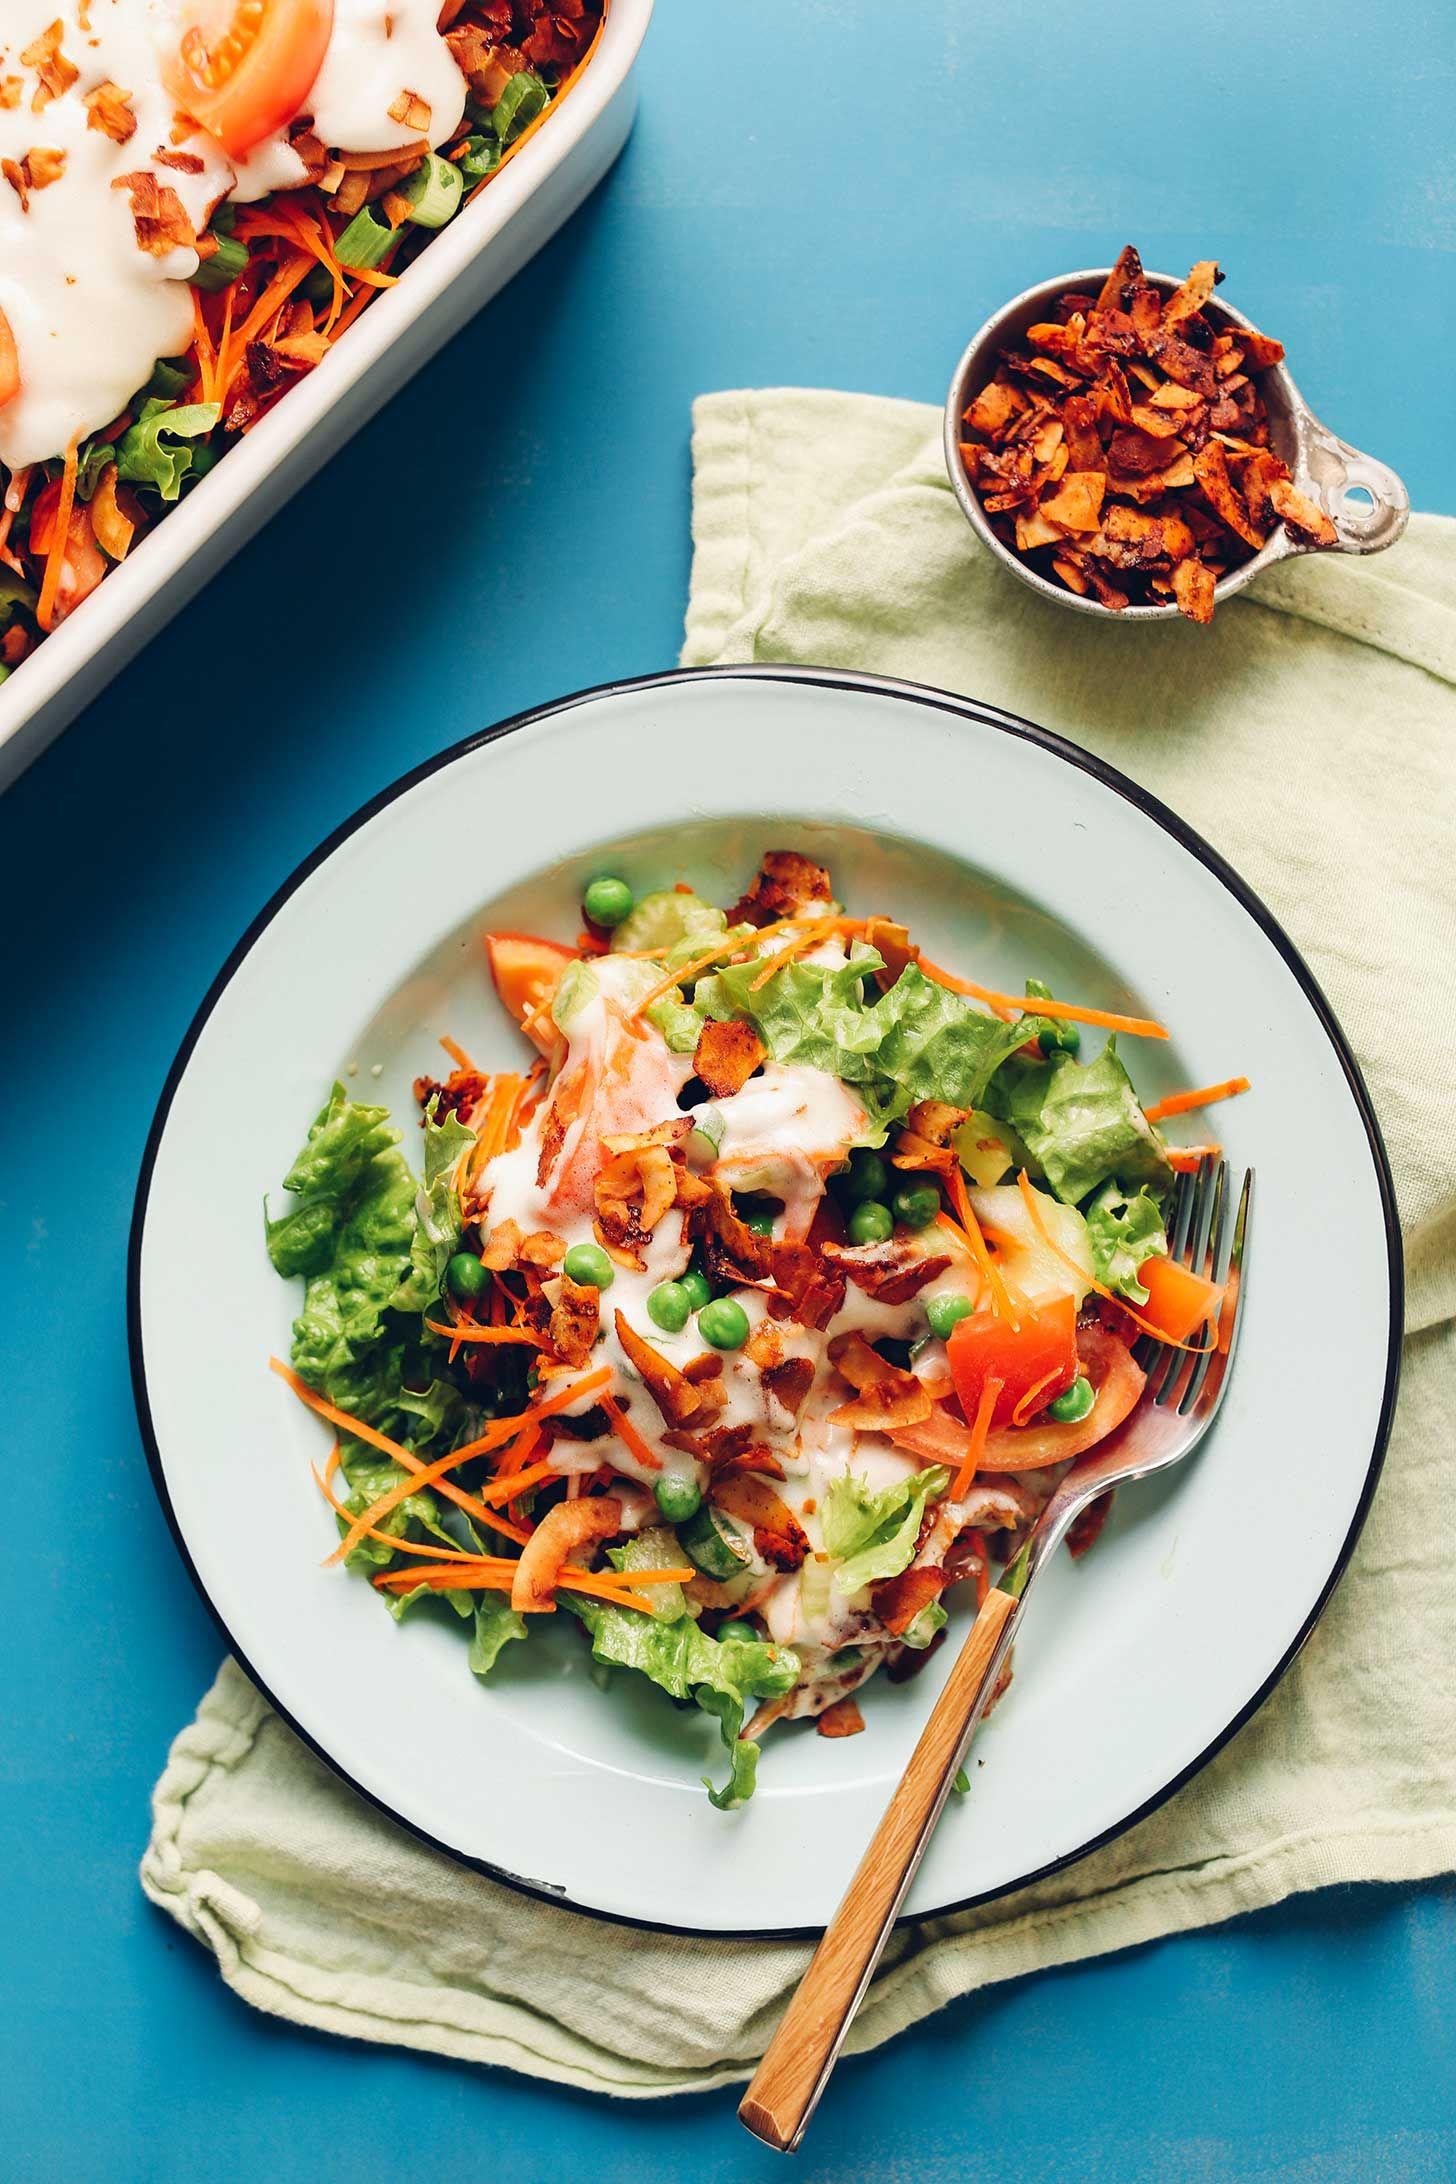 Vegan 7-Layer Salad recipe! This classic salad gets a modern, healthy twist.